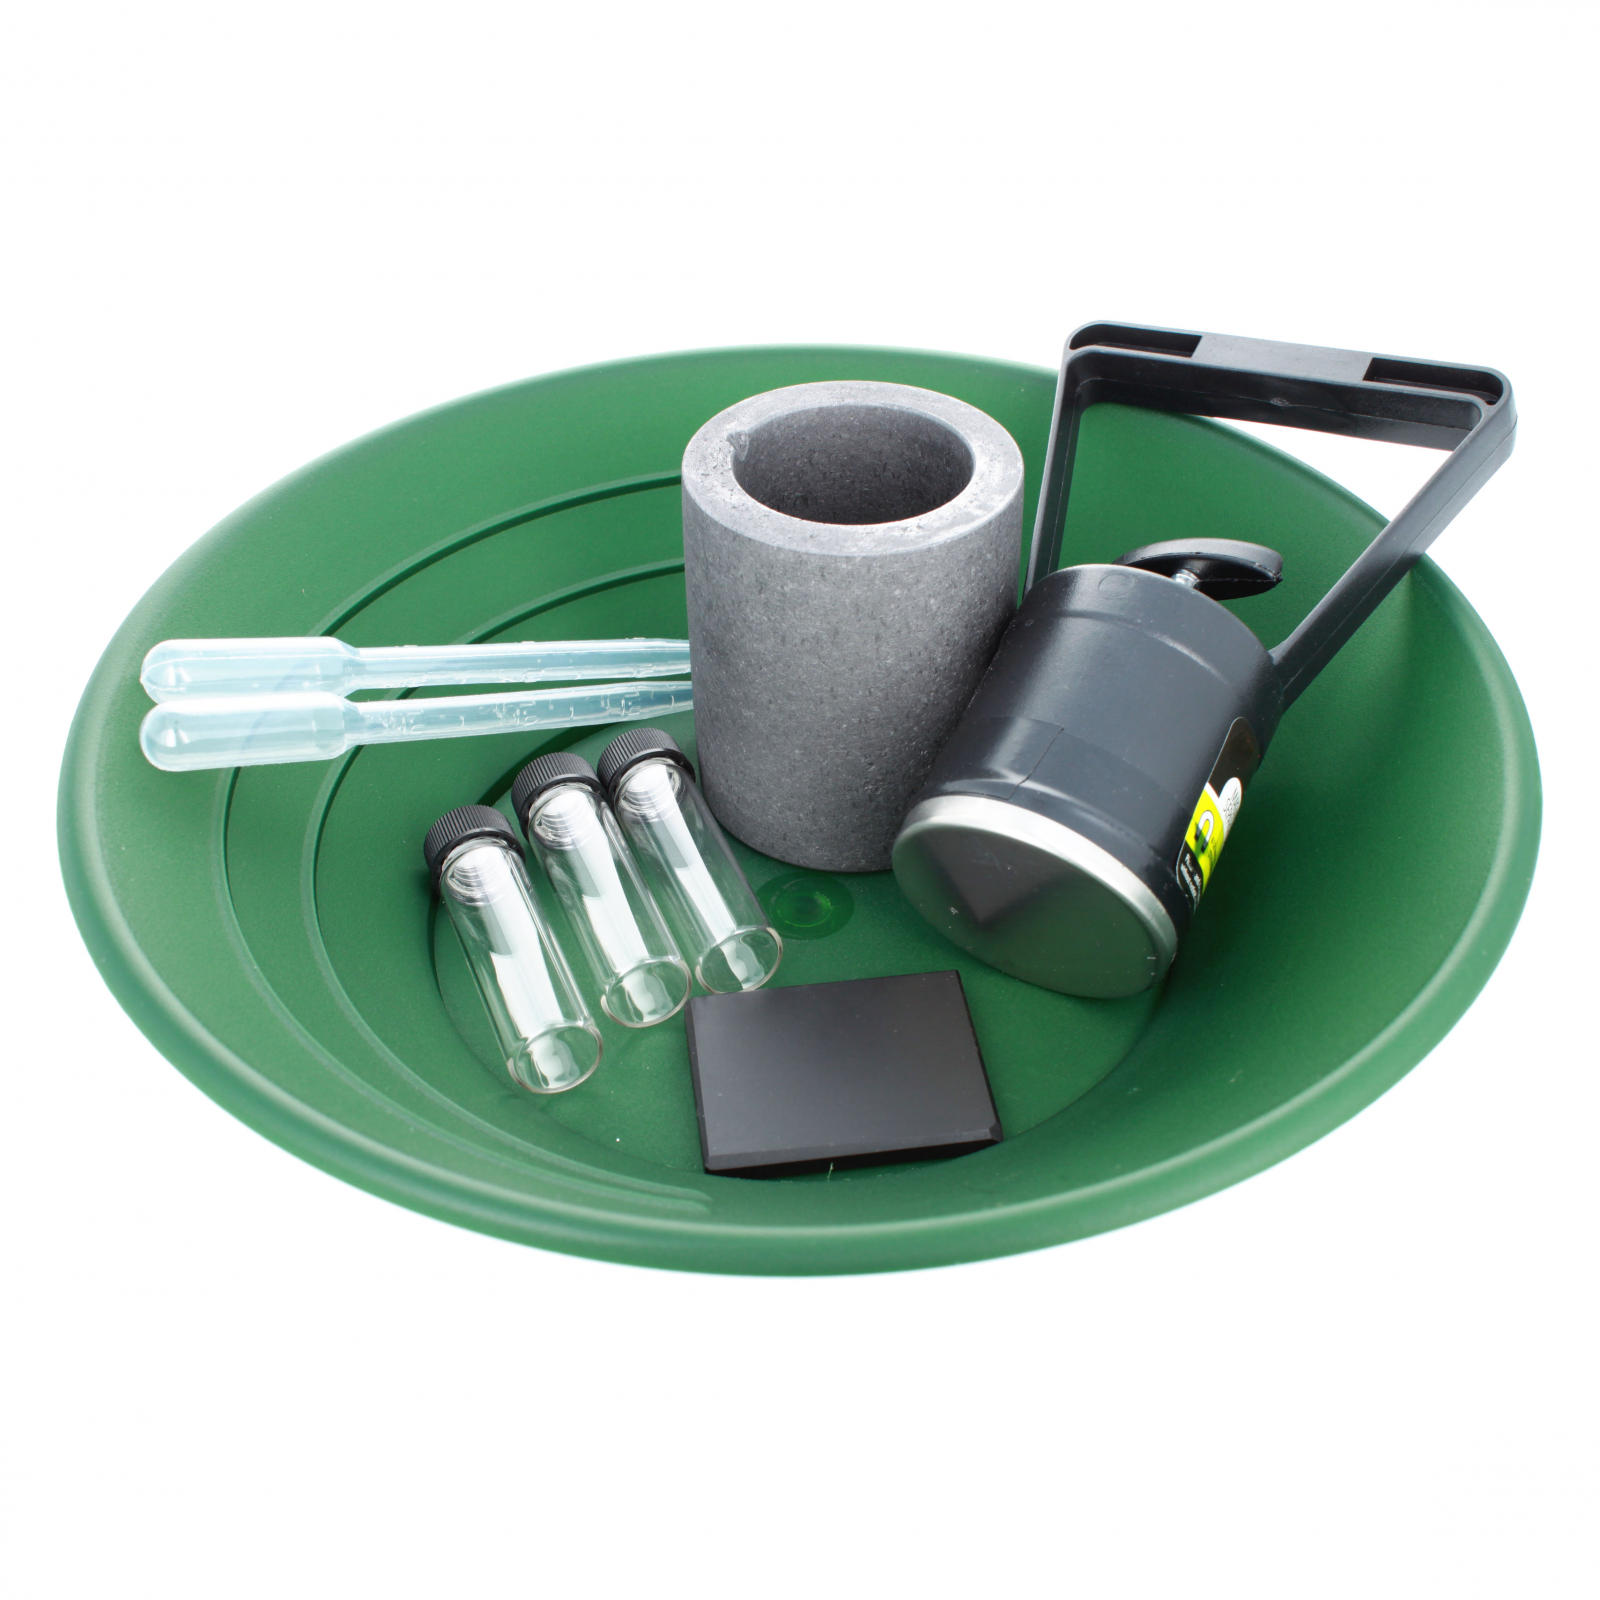 ASR Outdoor Gold Rush Gold Prospecting Pan Kit Glass Vials Testing Stone - 9pc